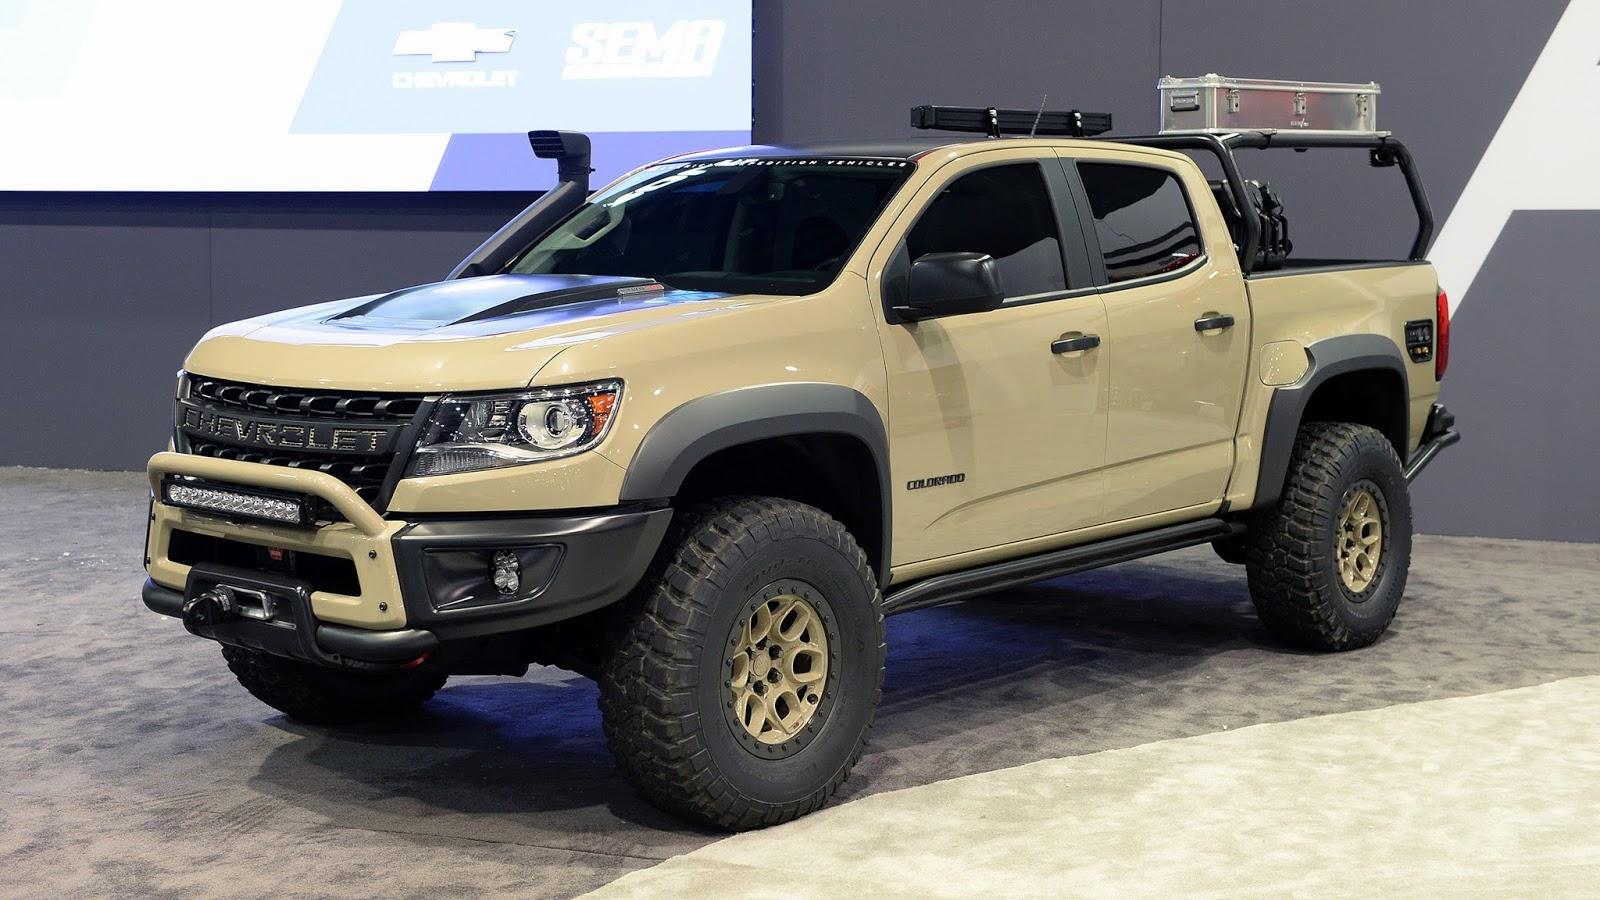 Colorado chevy colorado zr2 concept : Automotiveblogz: Chevrolet Colorado ZR2 AEV Concept: SEMA 2017